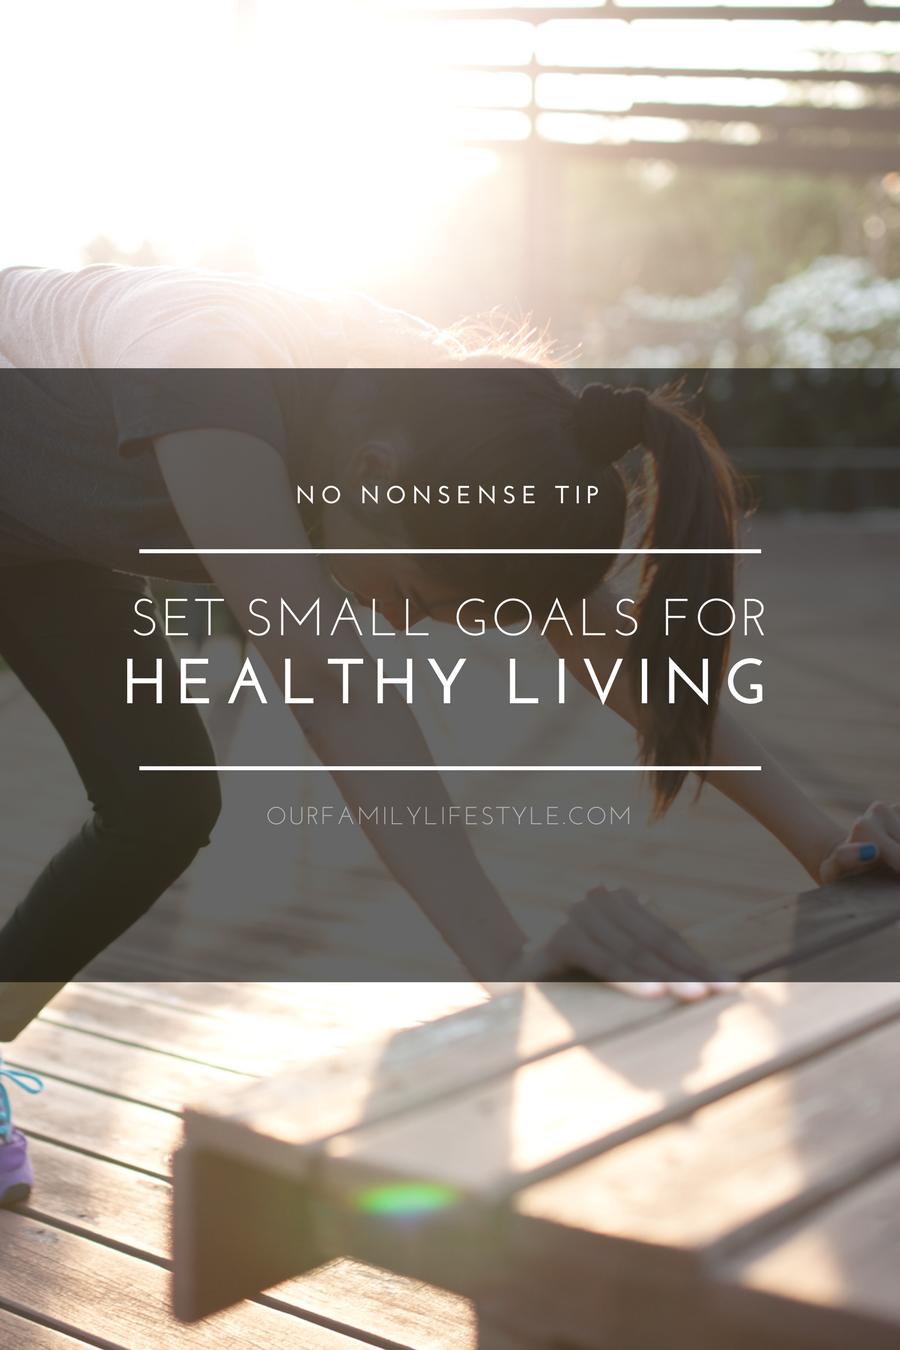 no nonsense tip - set small goals